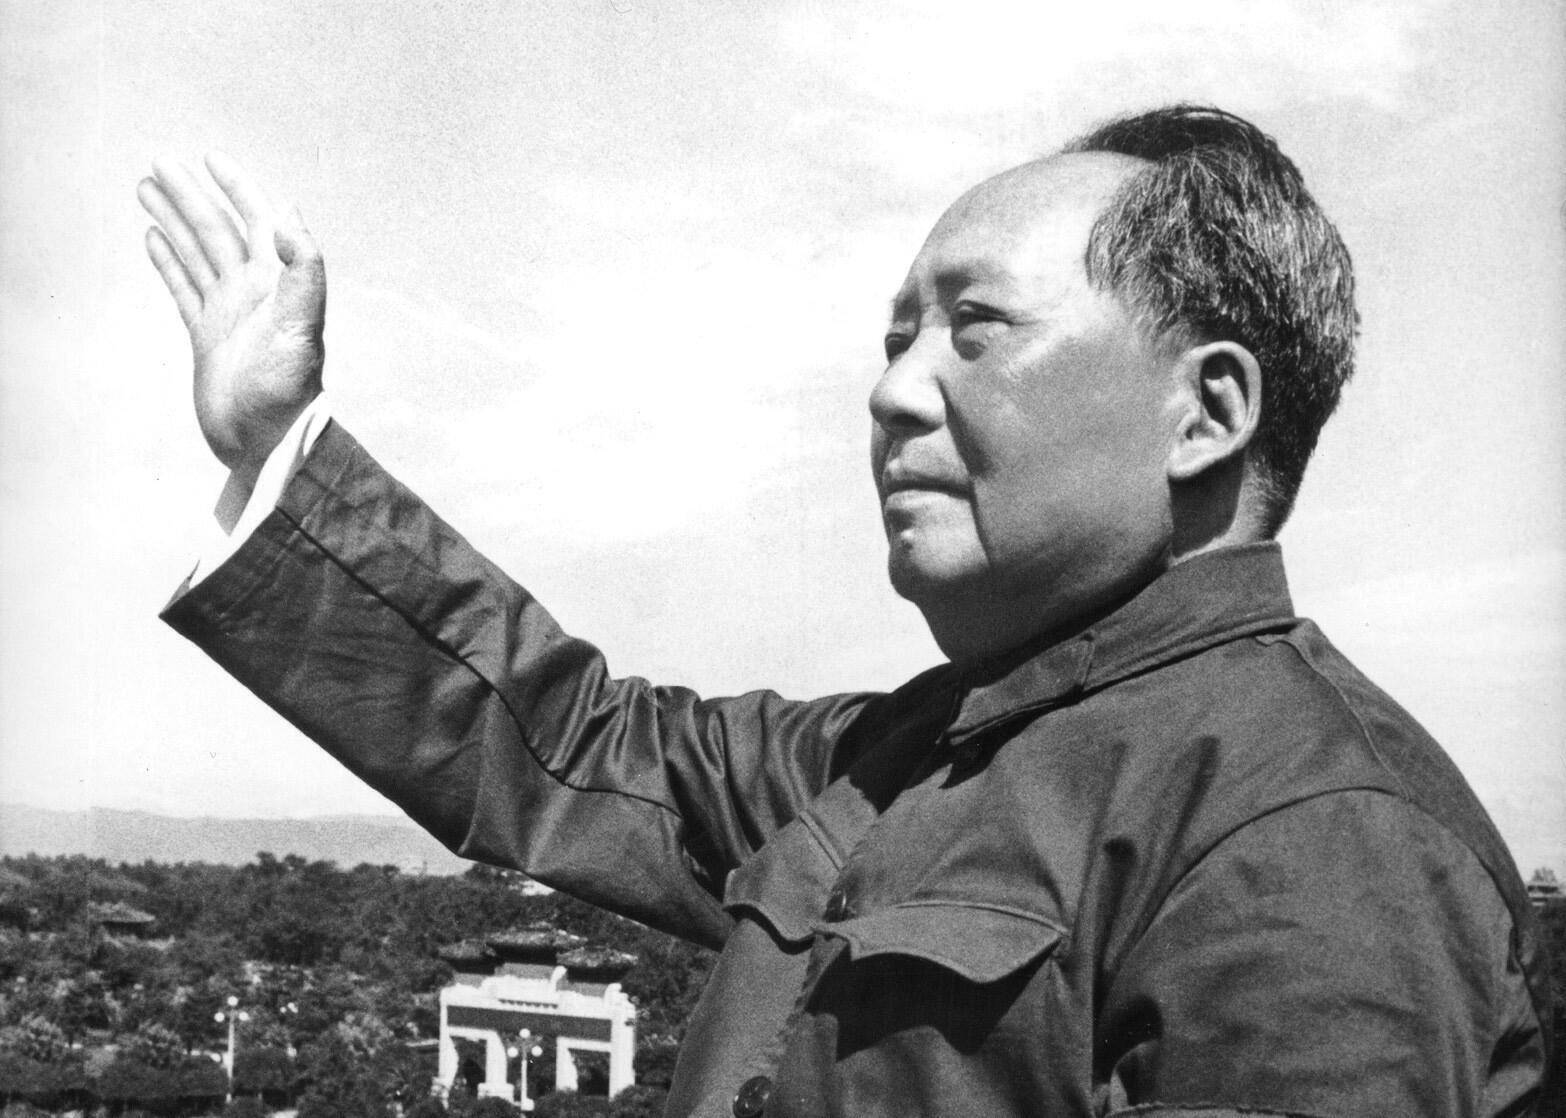 mao-zedong-revolution-culturelle-ok-ok